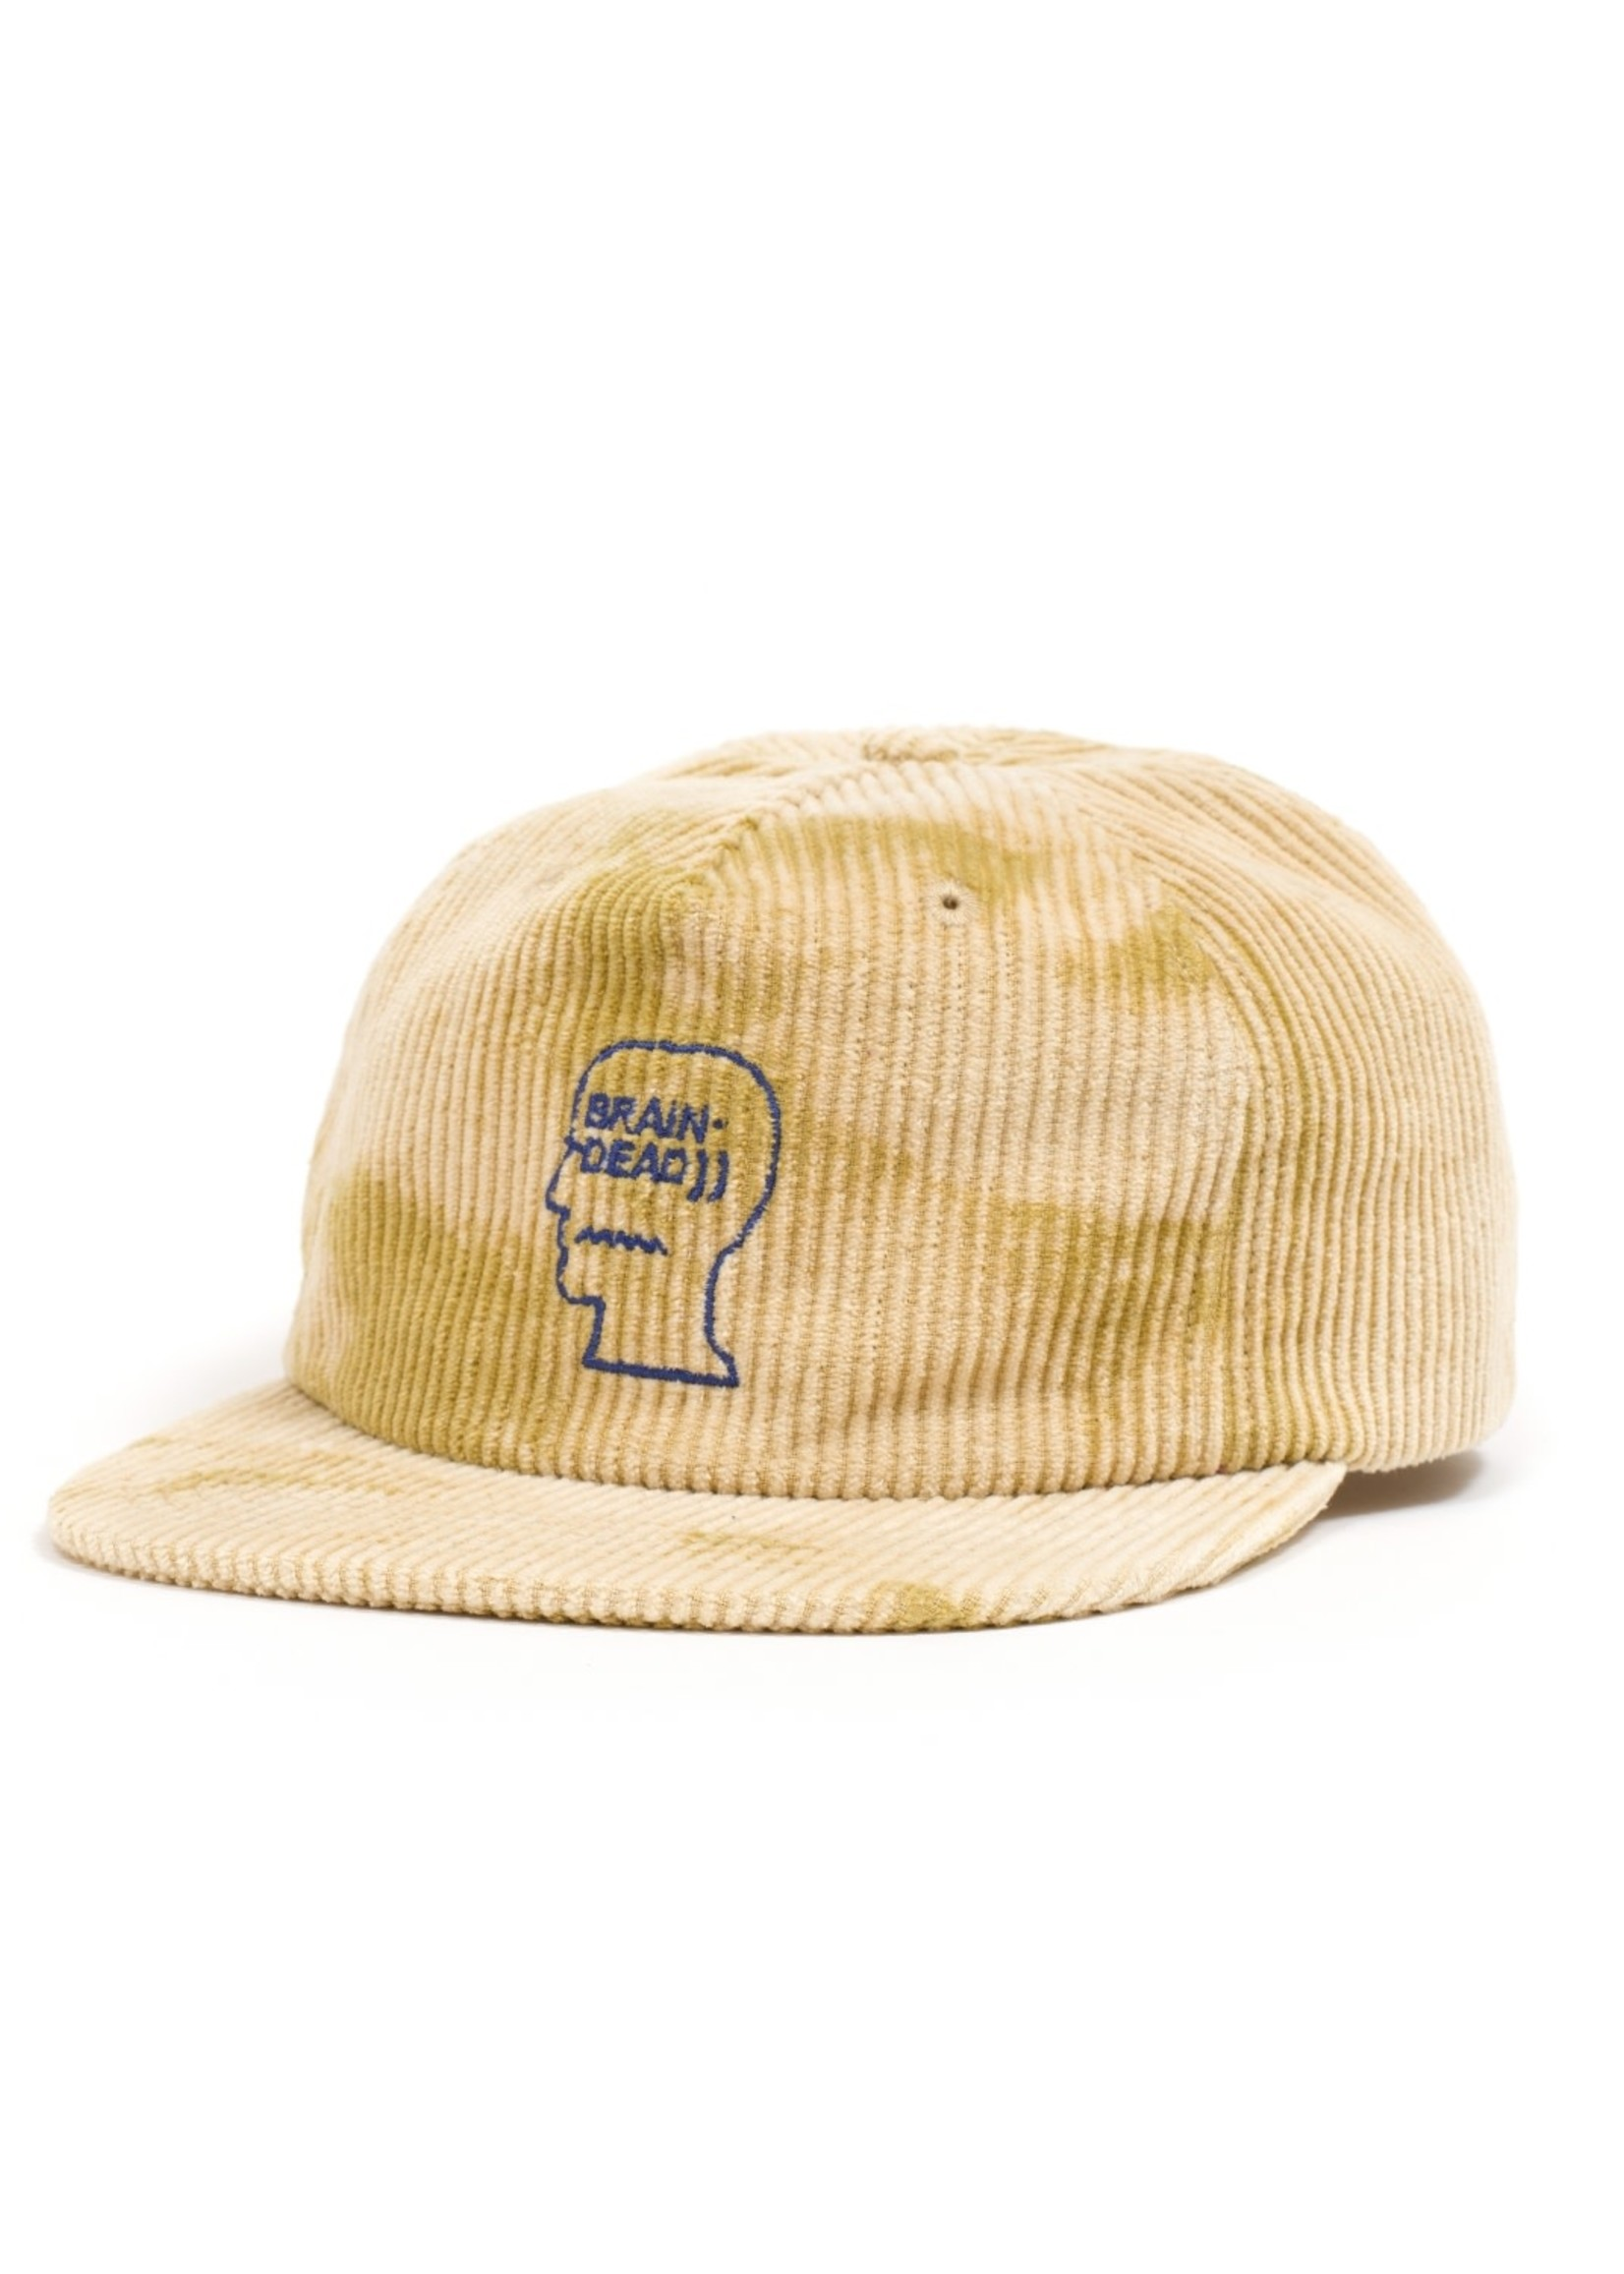 Brain Dead Gold Bleached Corduroy 5 panel Cap with logo